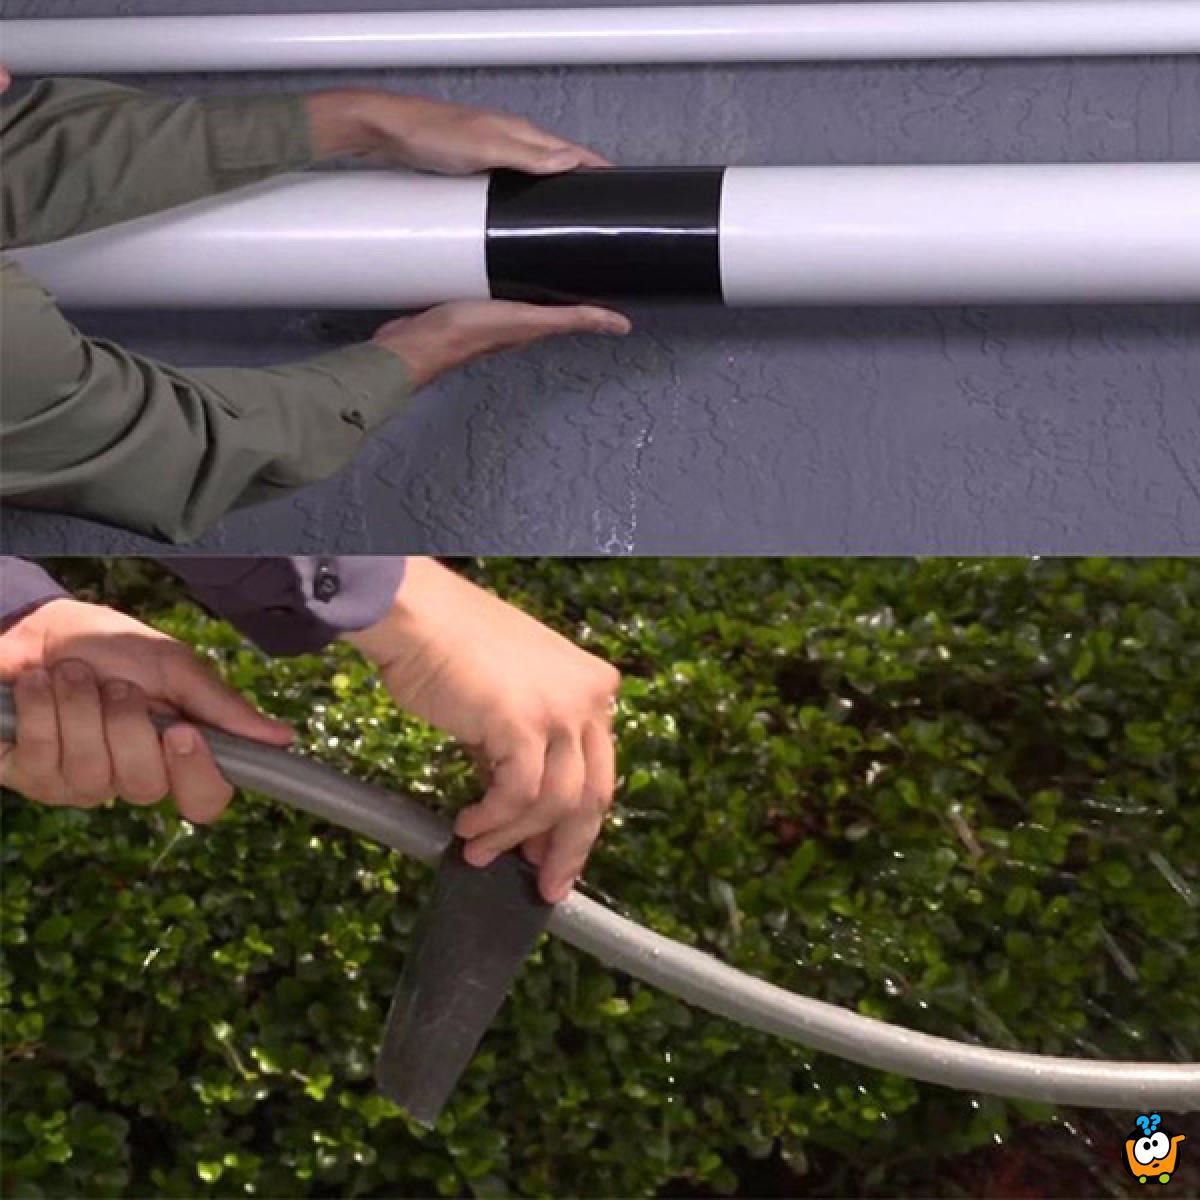 FLEX TAPE 10 x 150 cm - Super jaka vodootporna izolir traka za sve vrste popravki